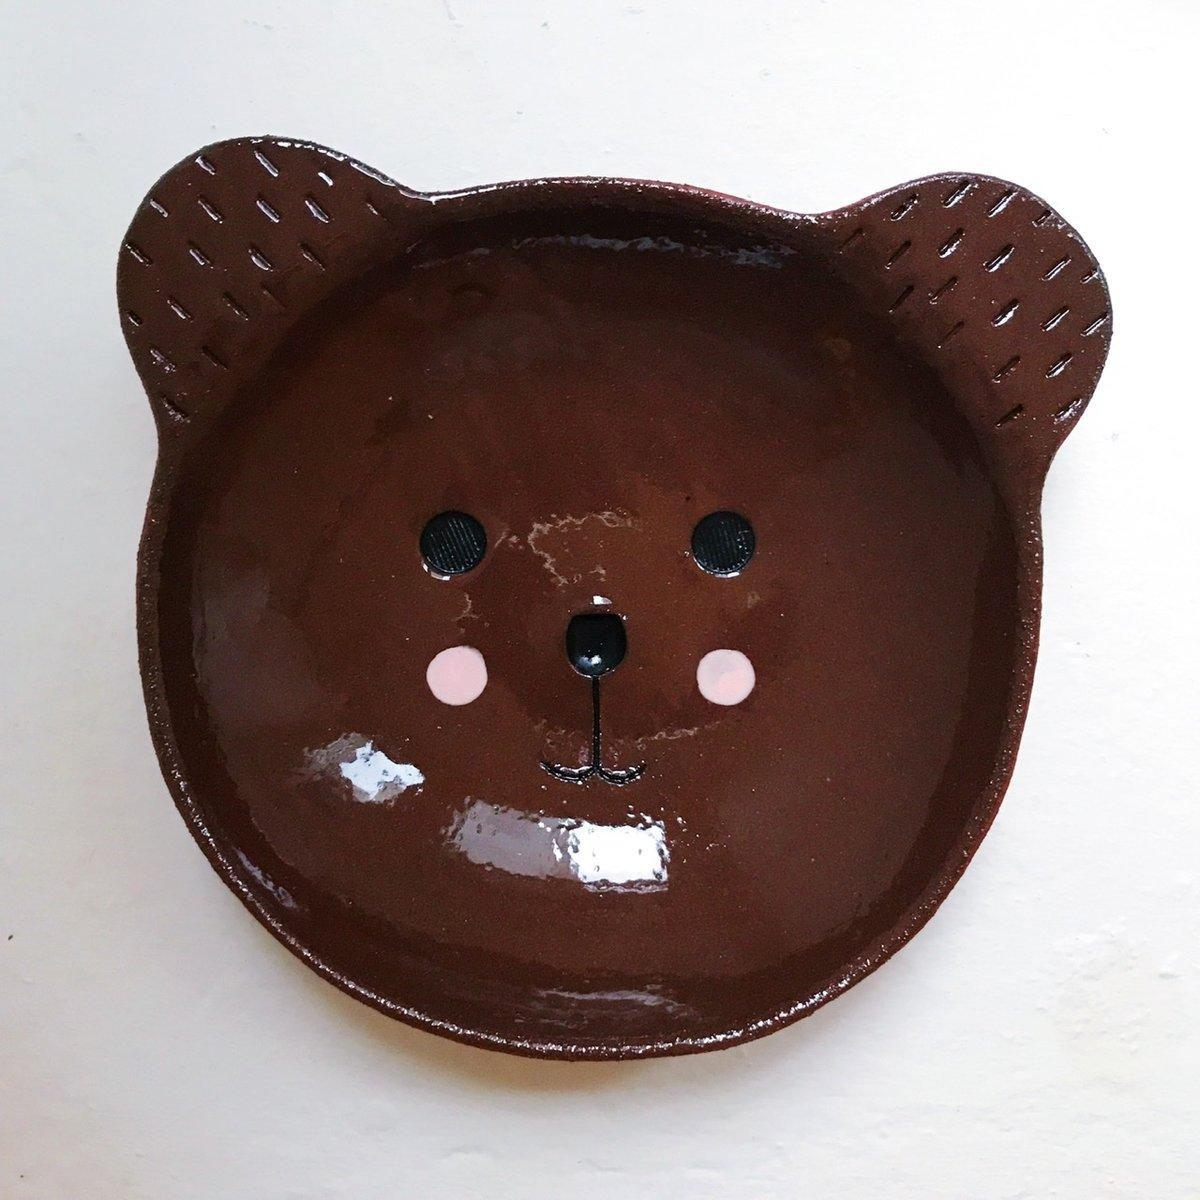 Image of Bear - deep dish